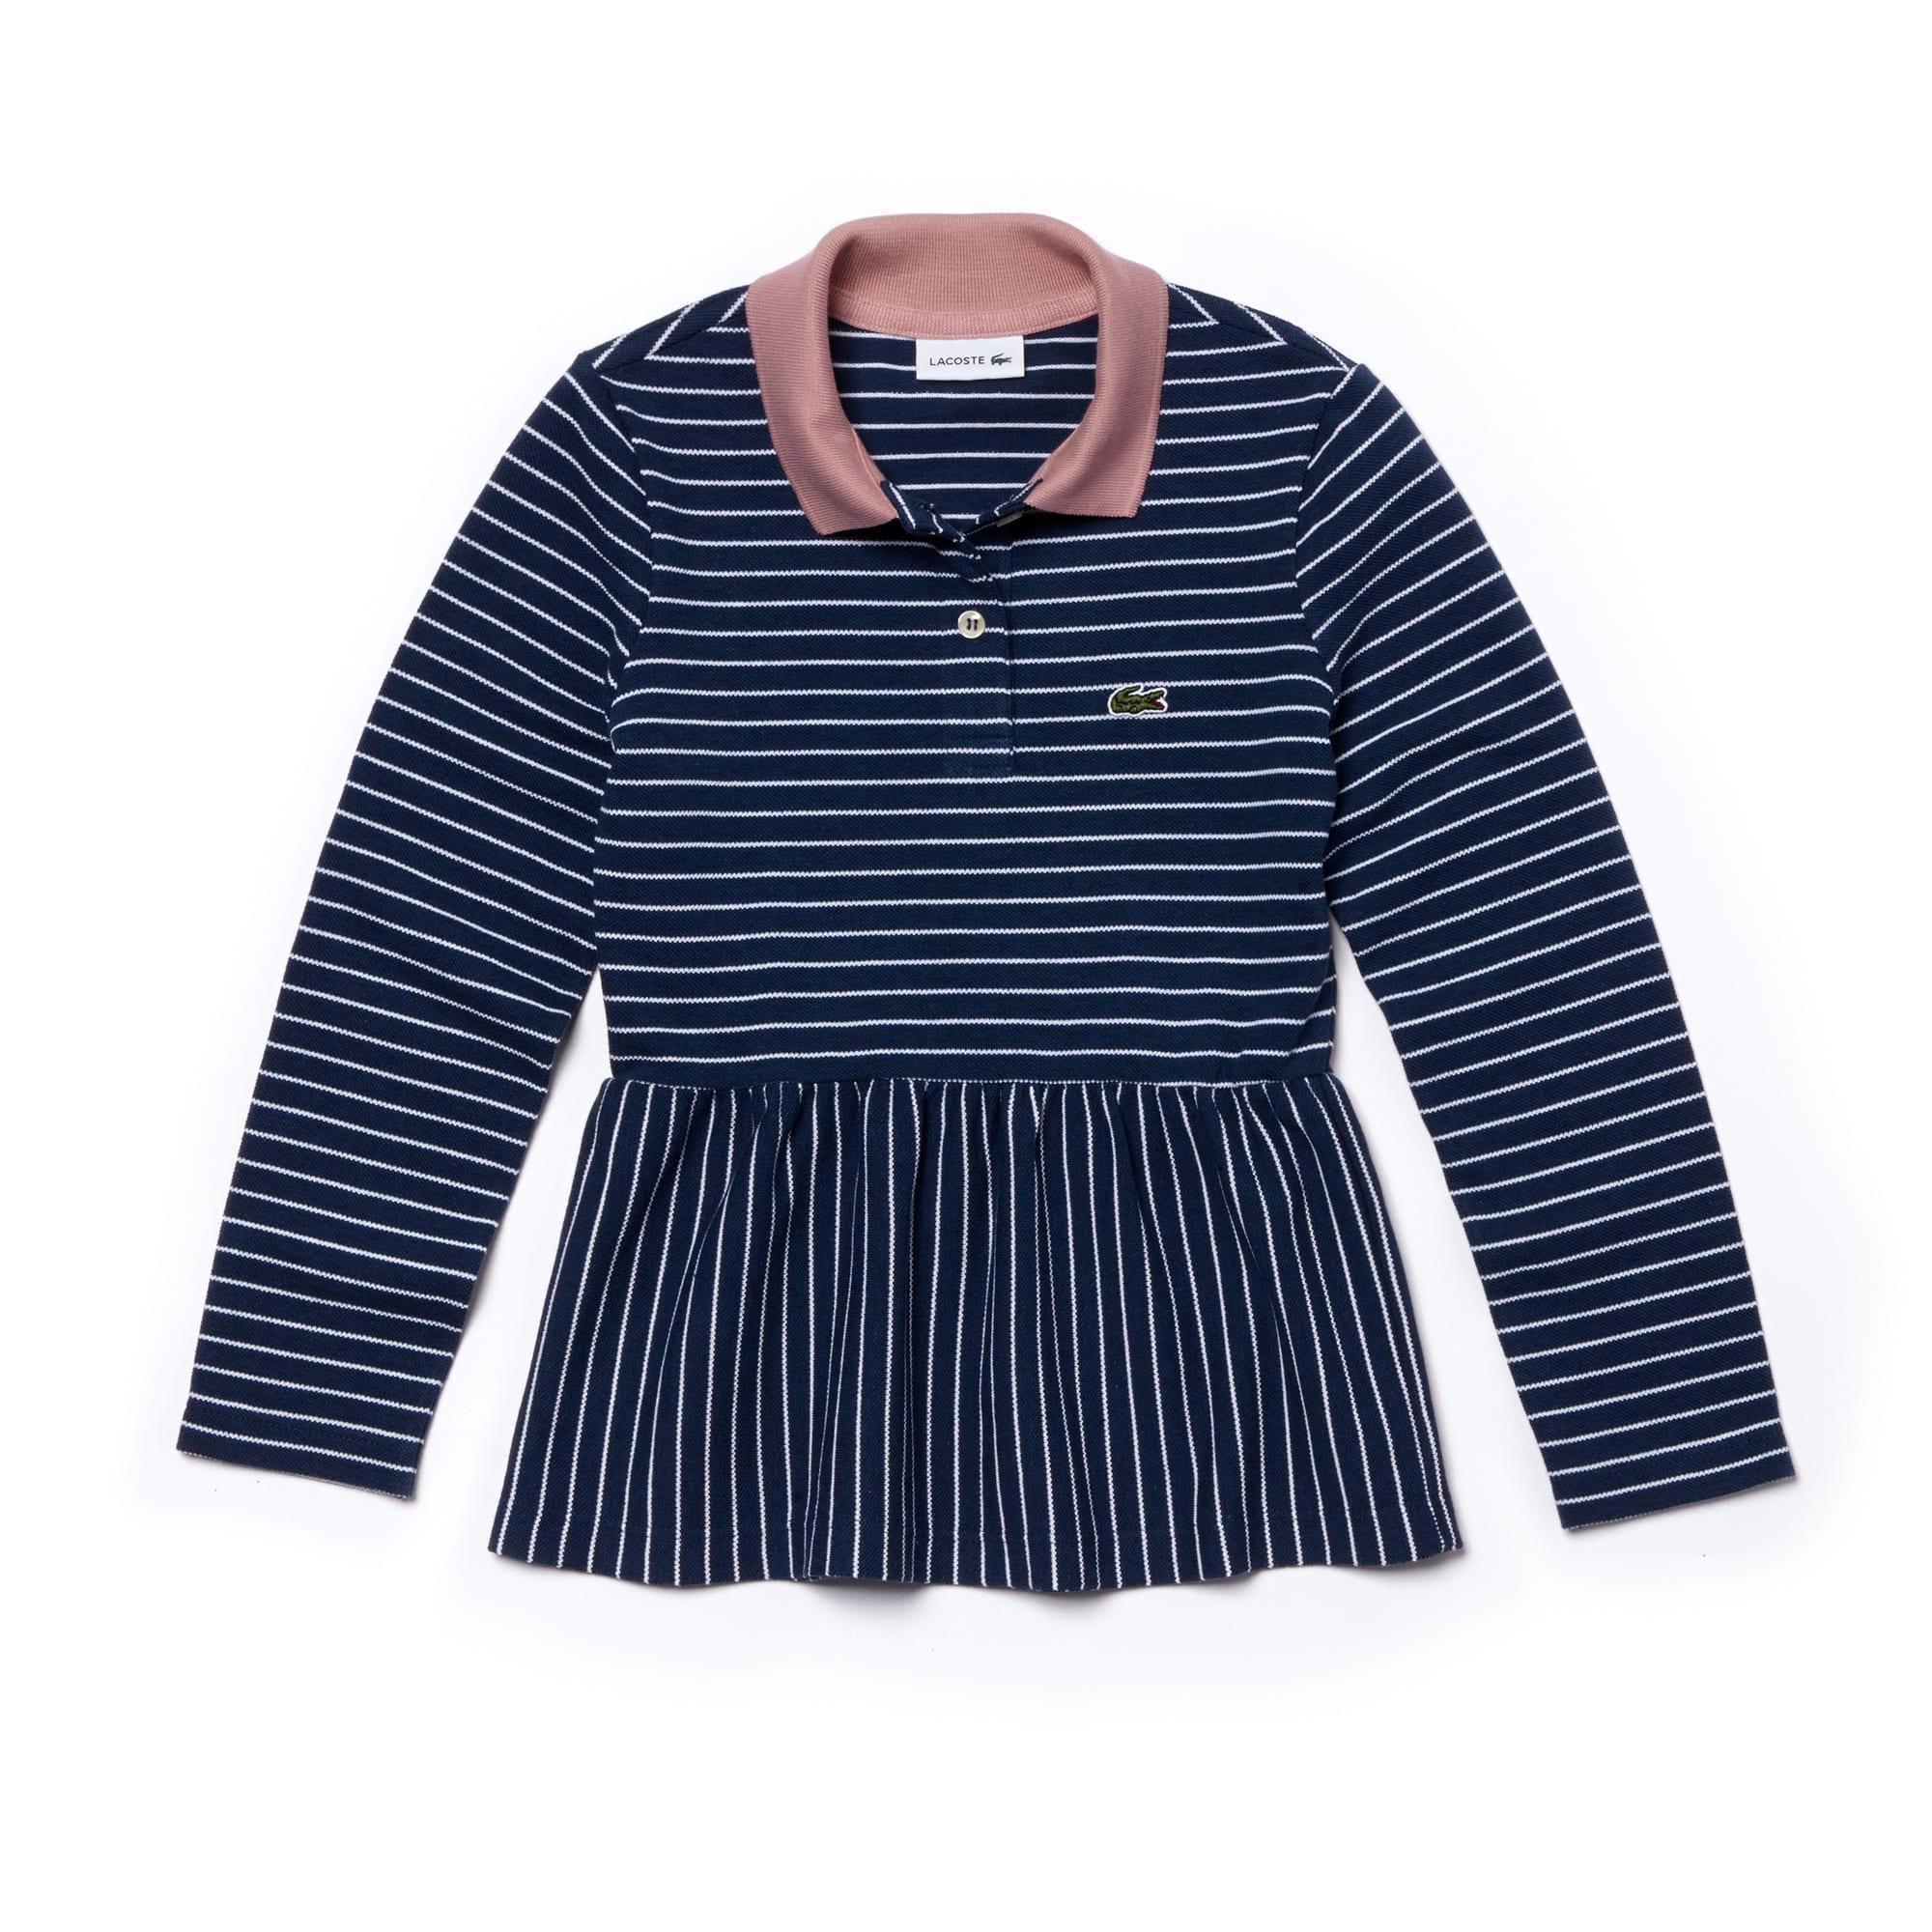 Girls' Lacoste Striped Piqué Polo Shirt